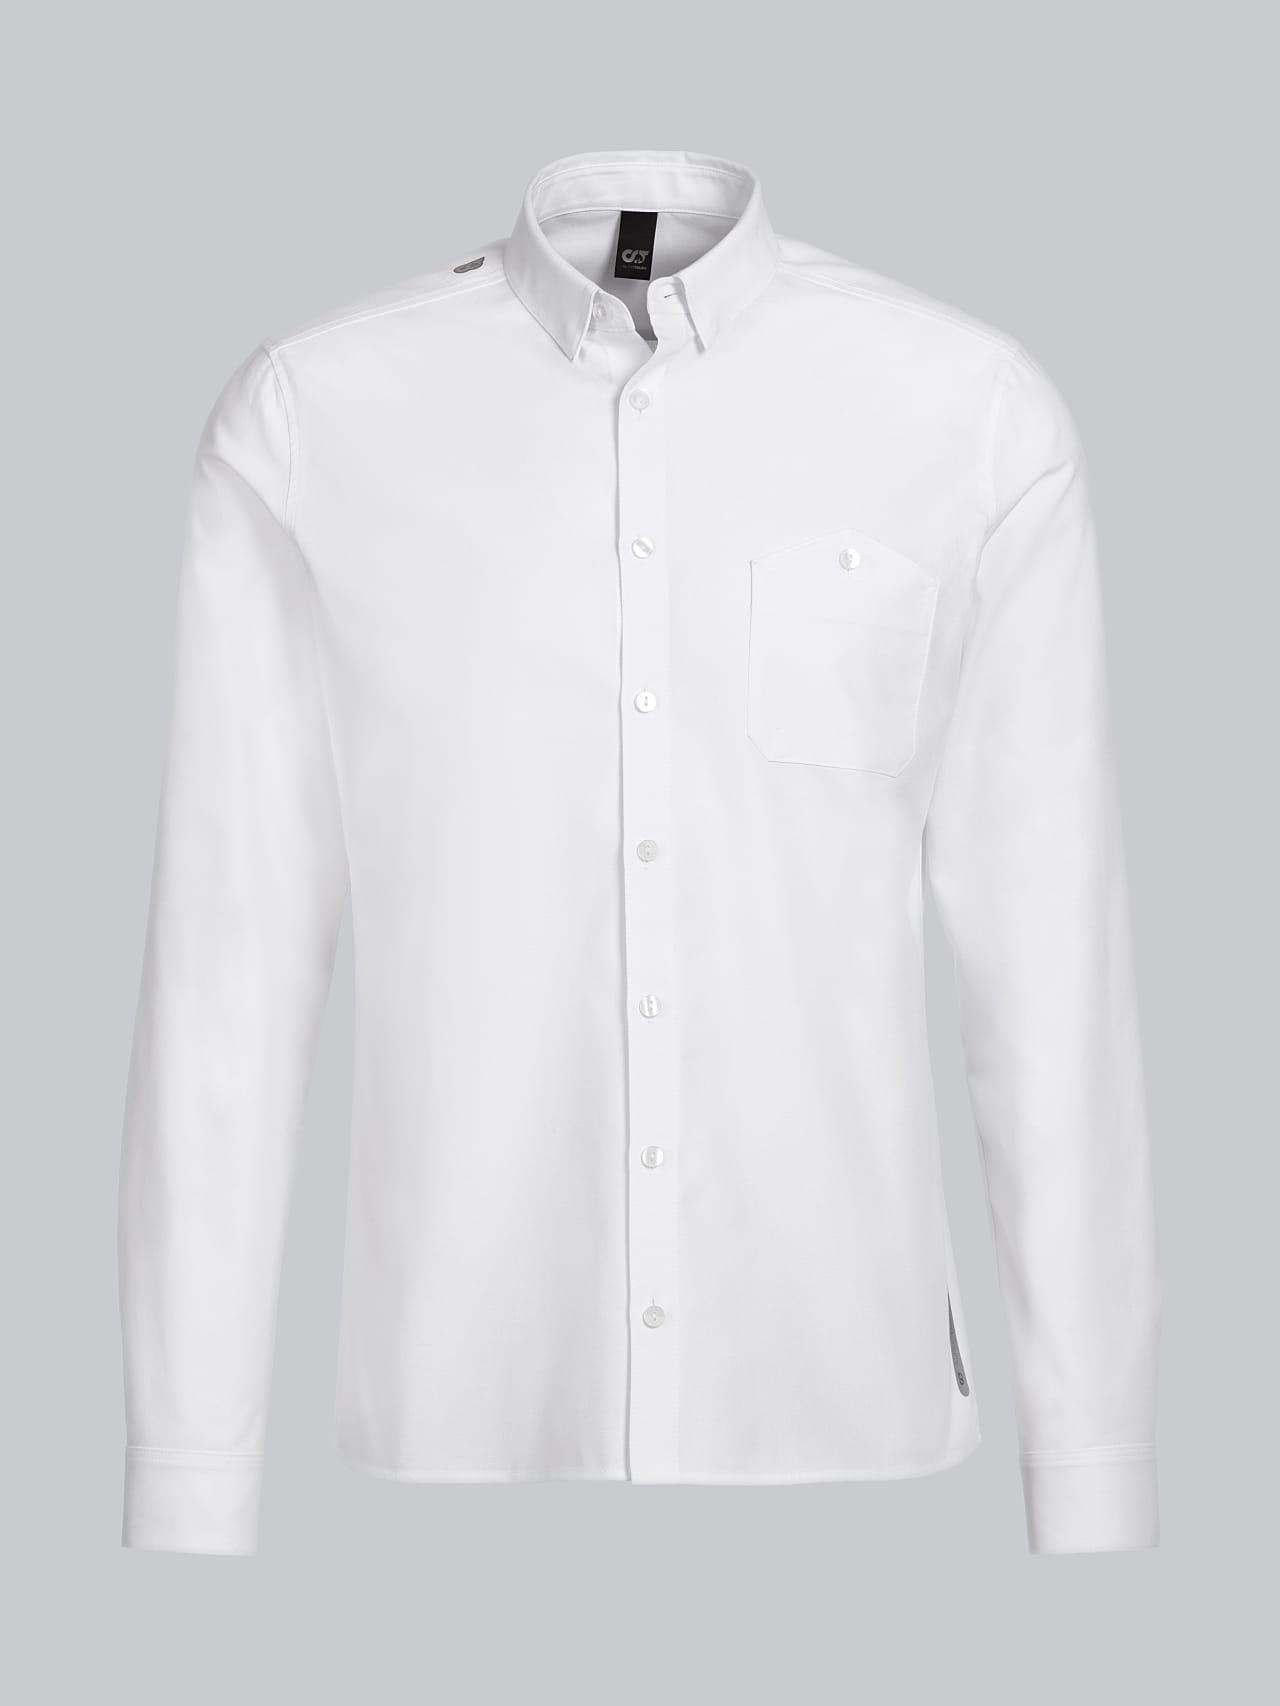 WOSKA V2.Y5.01 Kent Collar Oxford Shirt white Back Alpha Tauri